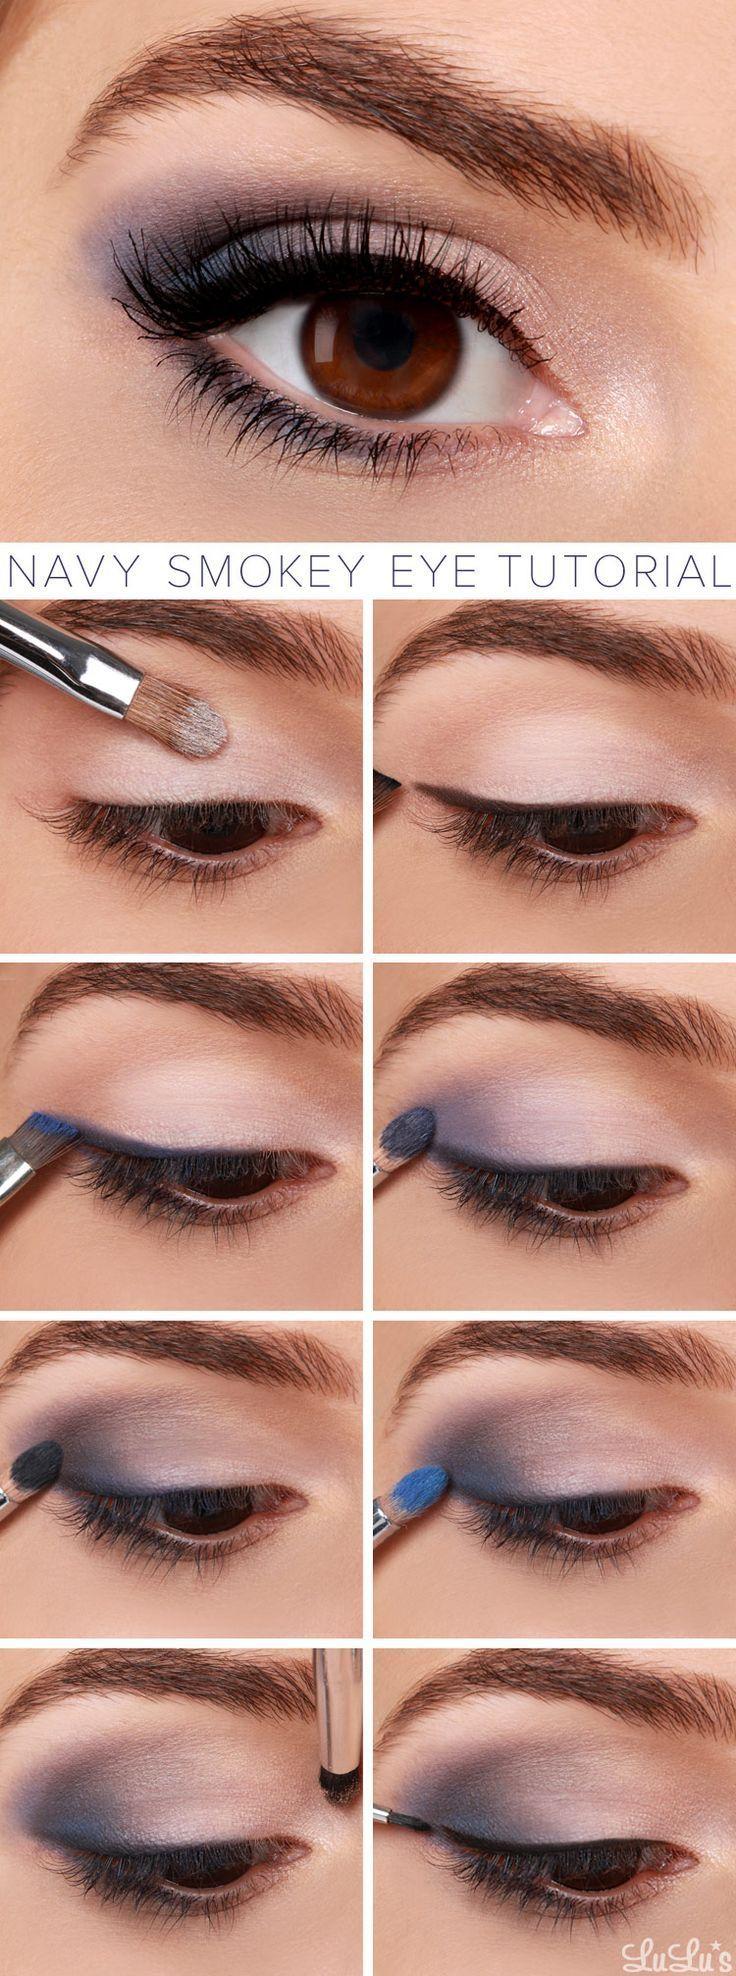 LuLu*s HowTo Navy Smokey Eye Makeup Tutorial Smokey